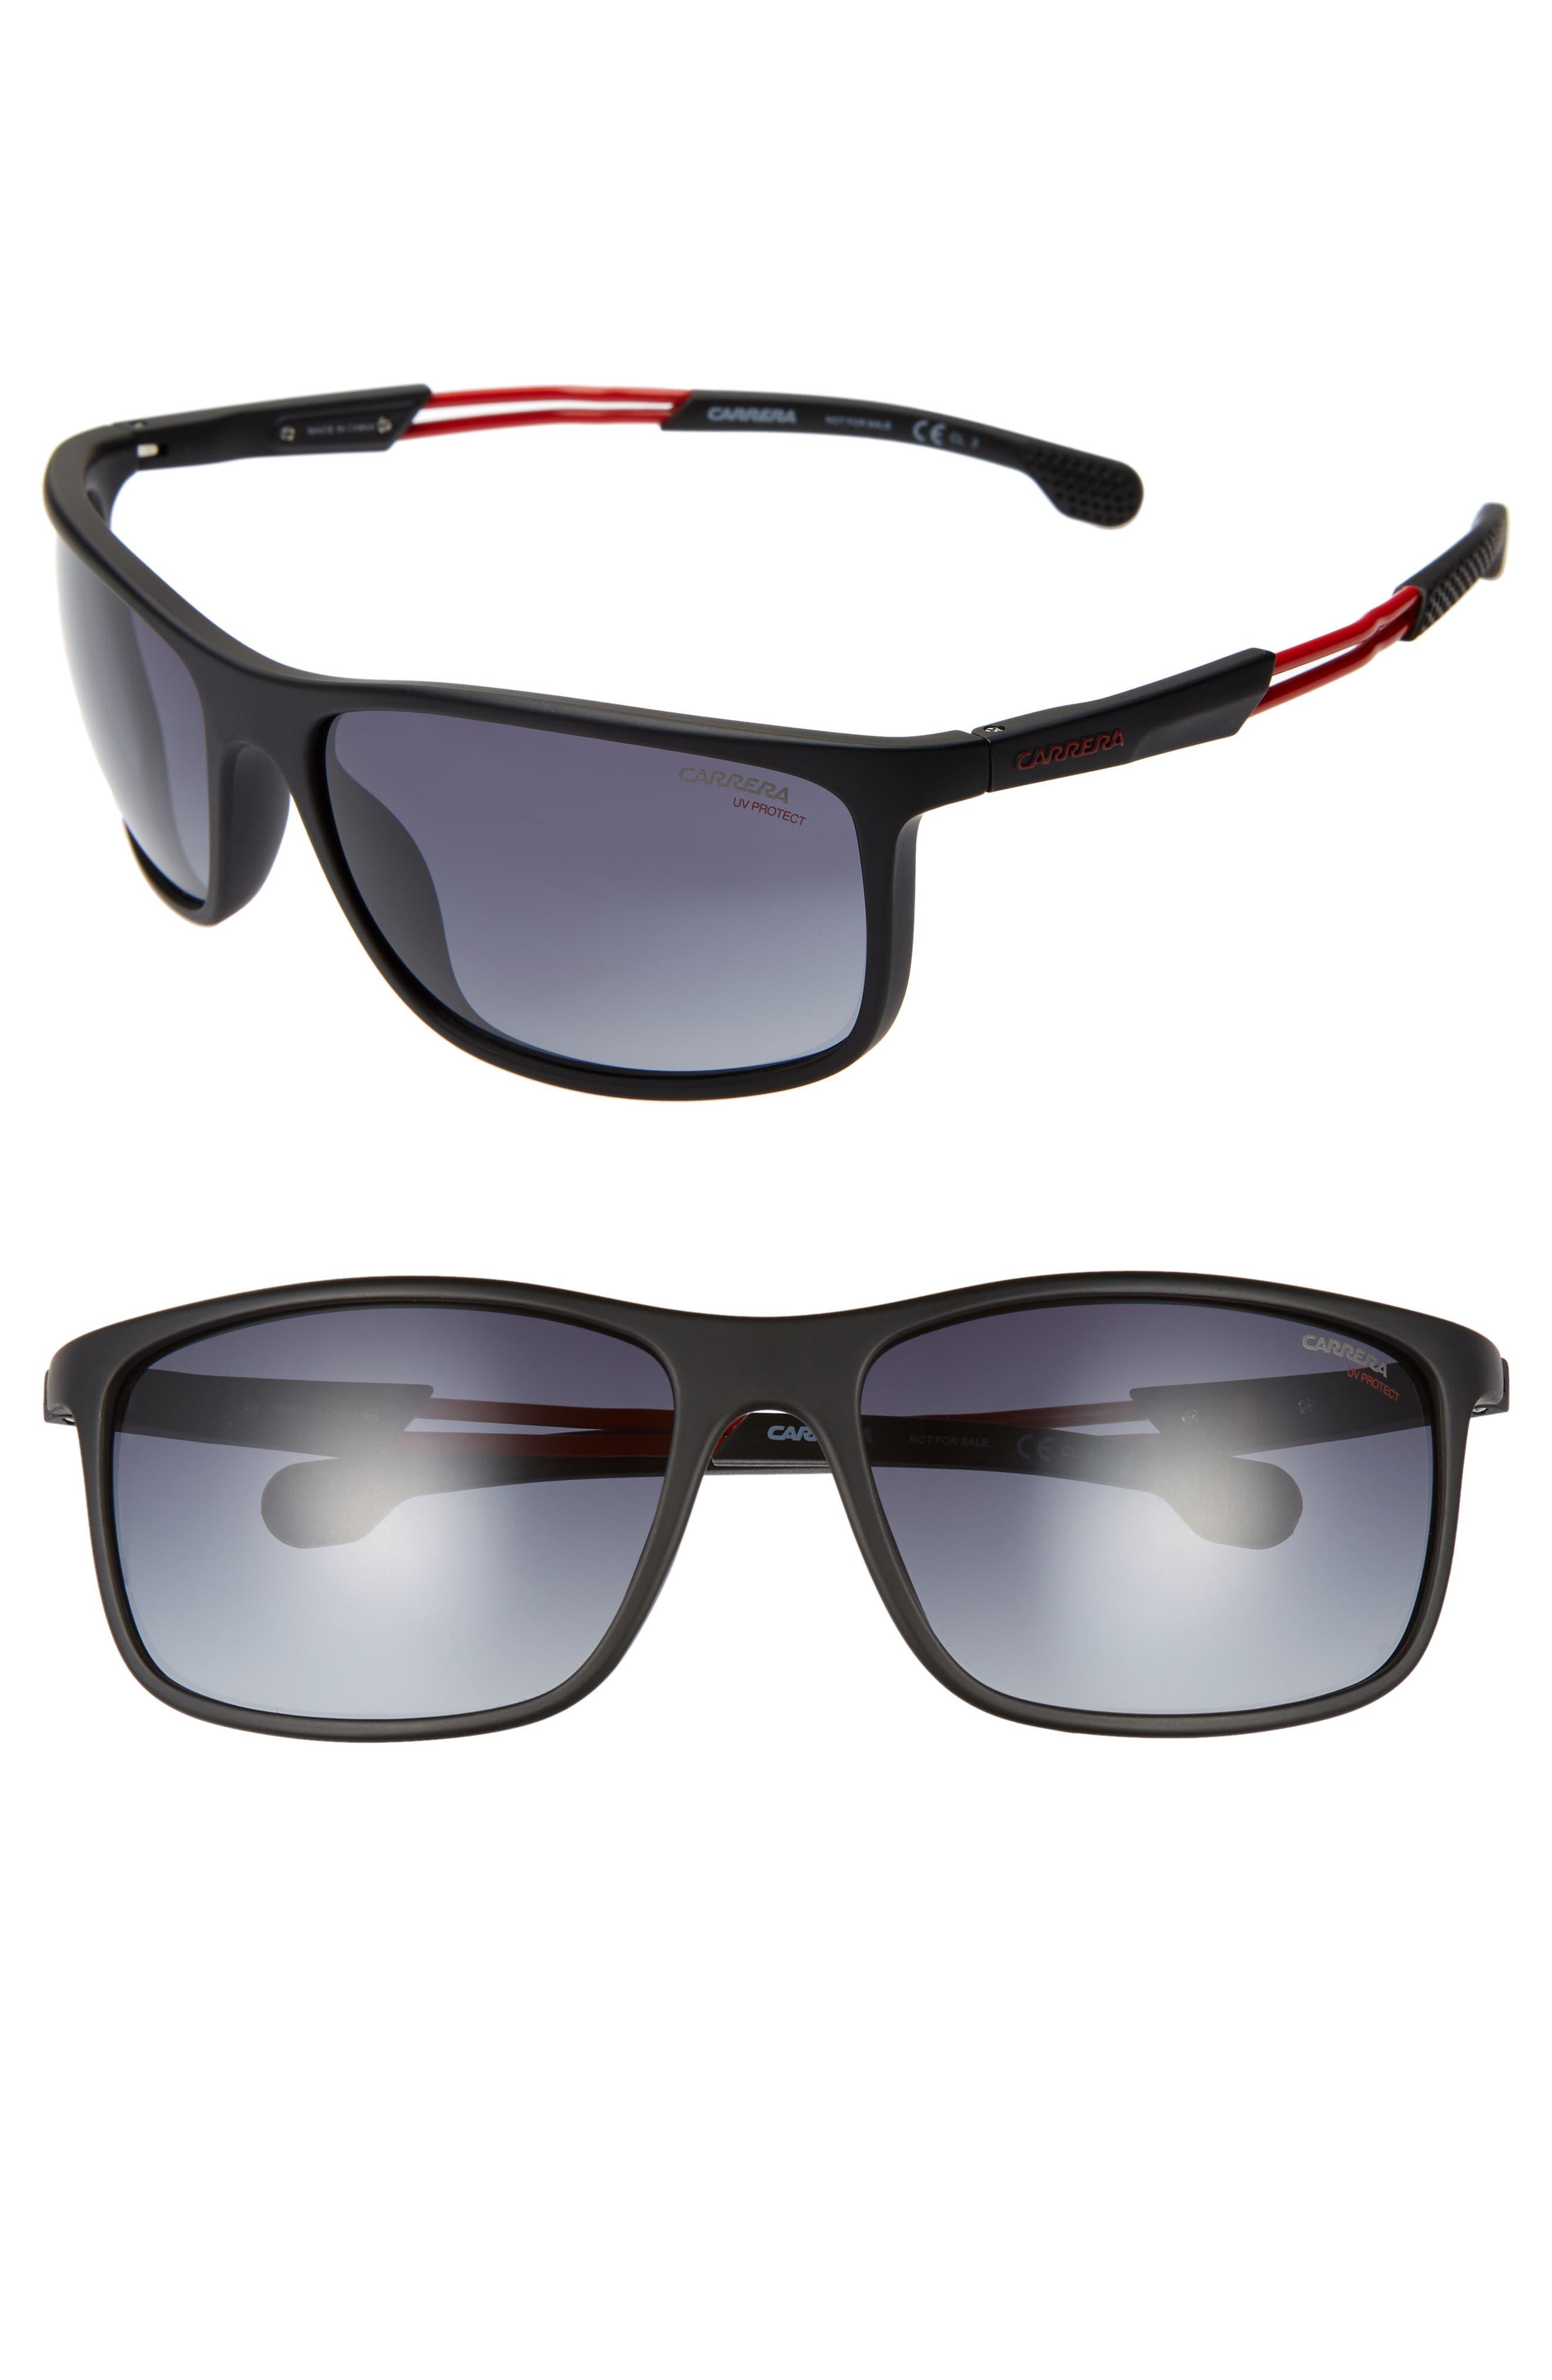 Carrera Eyewear 62Mm Wrap Sunglasses - Matte Black/gray Gradient